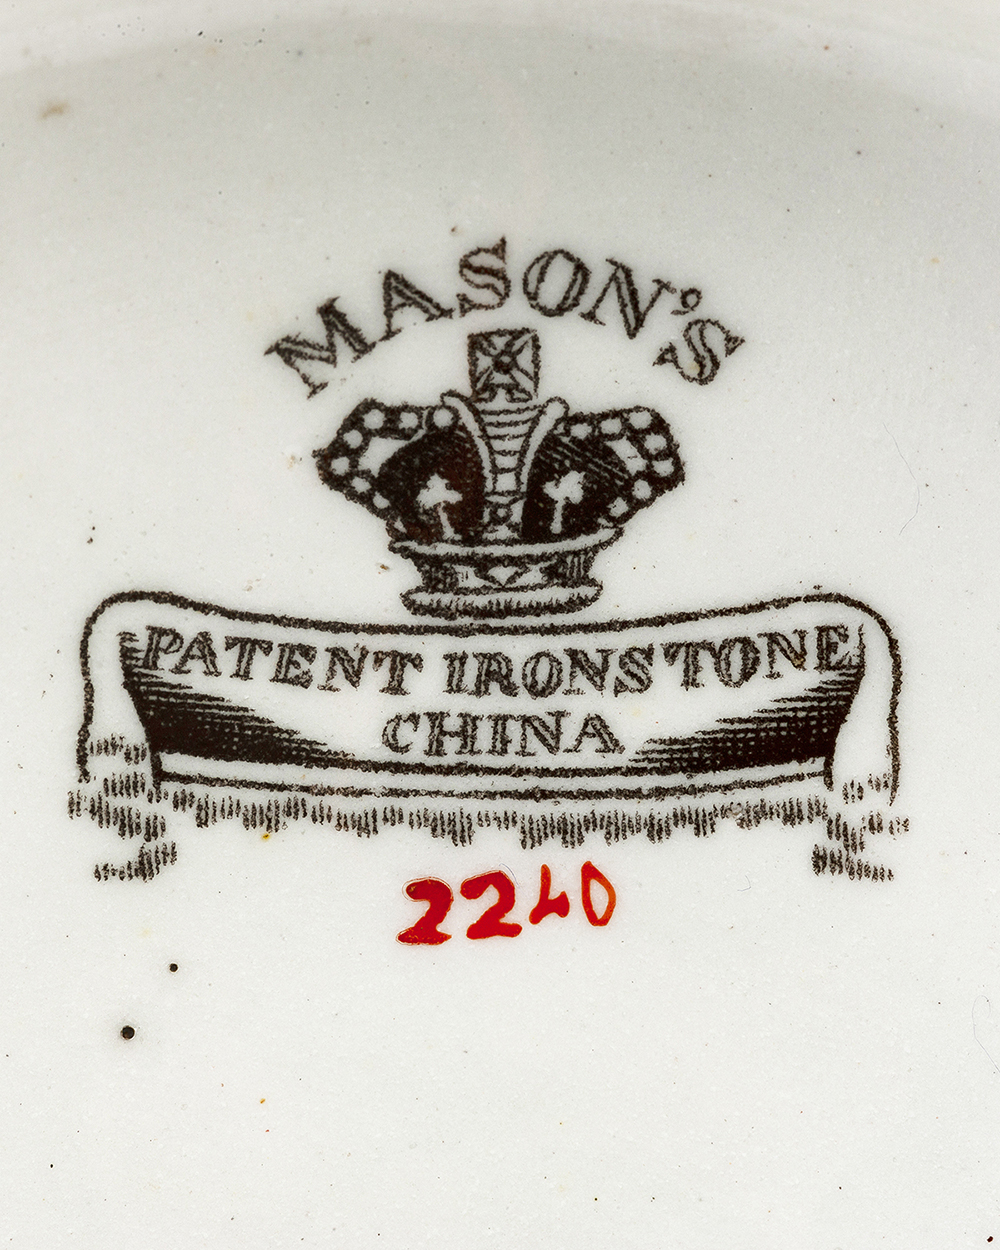 Lot 1026 - Two Mason's Ironstone tureens